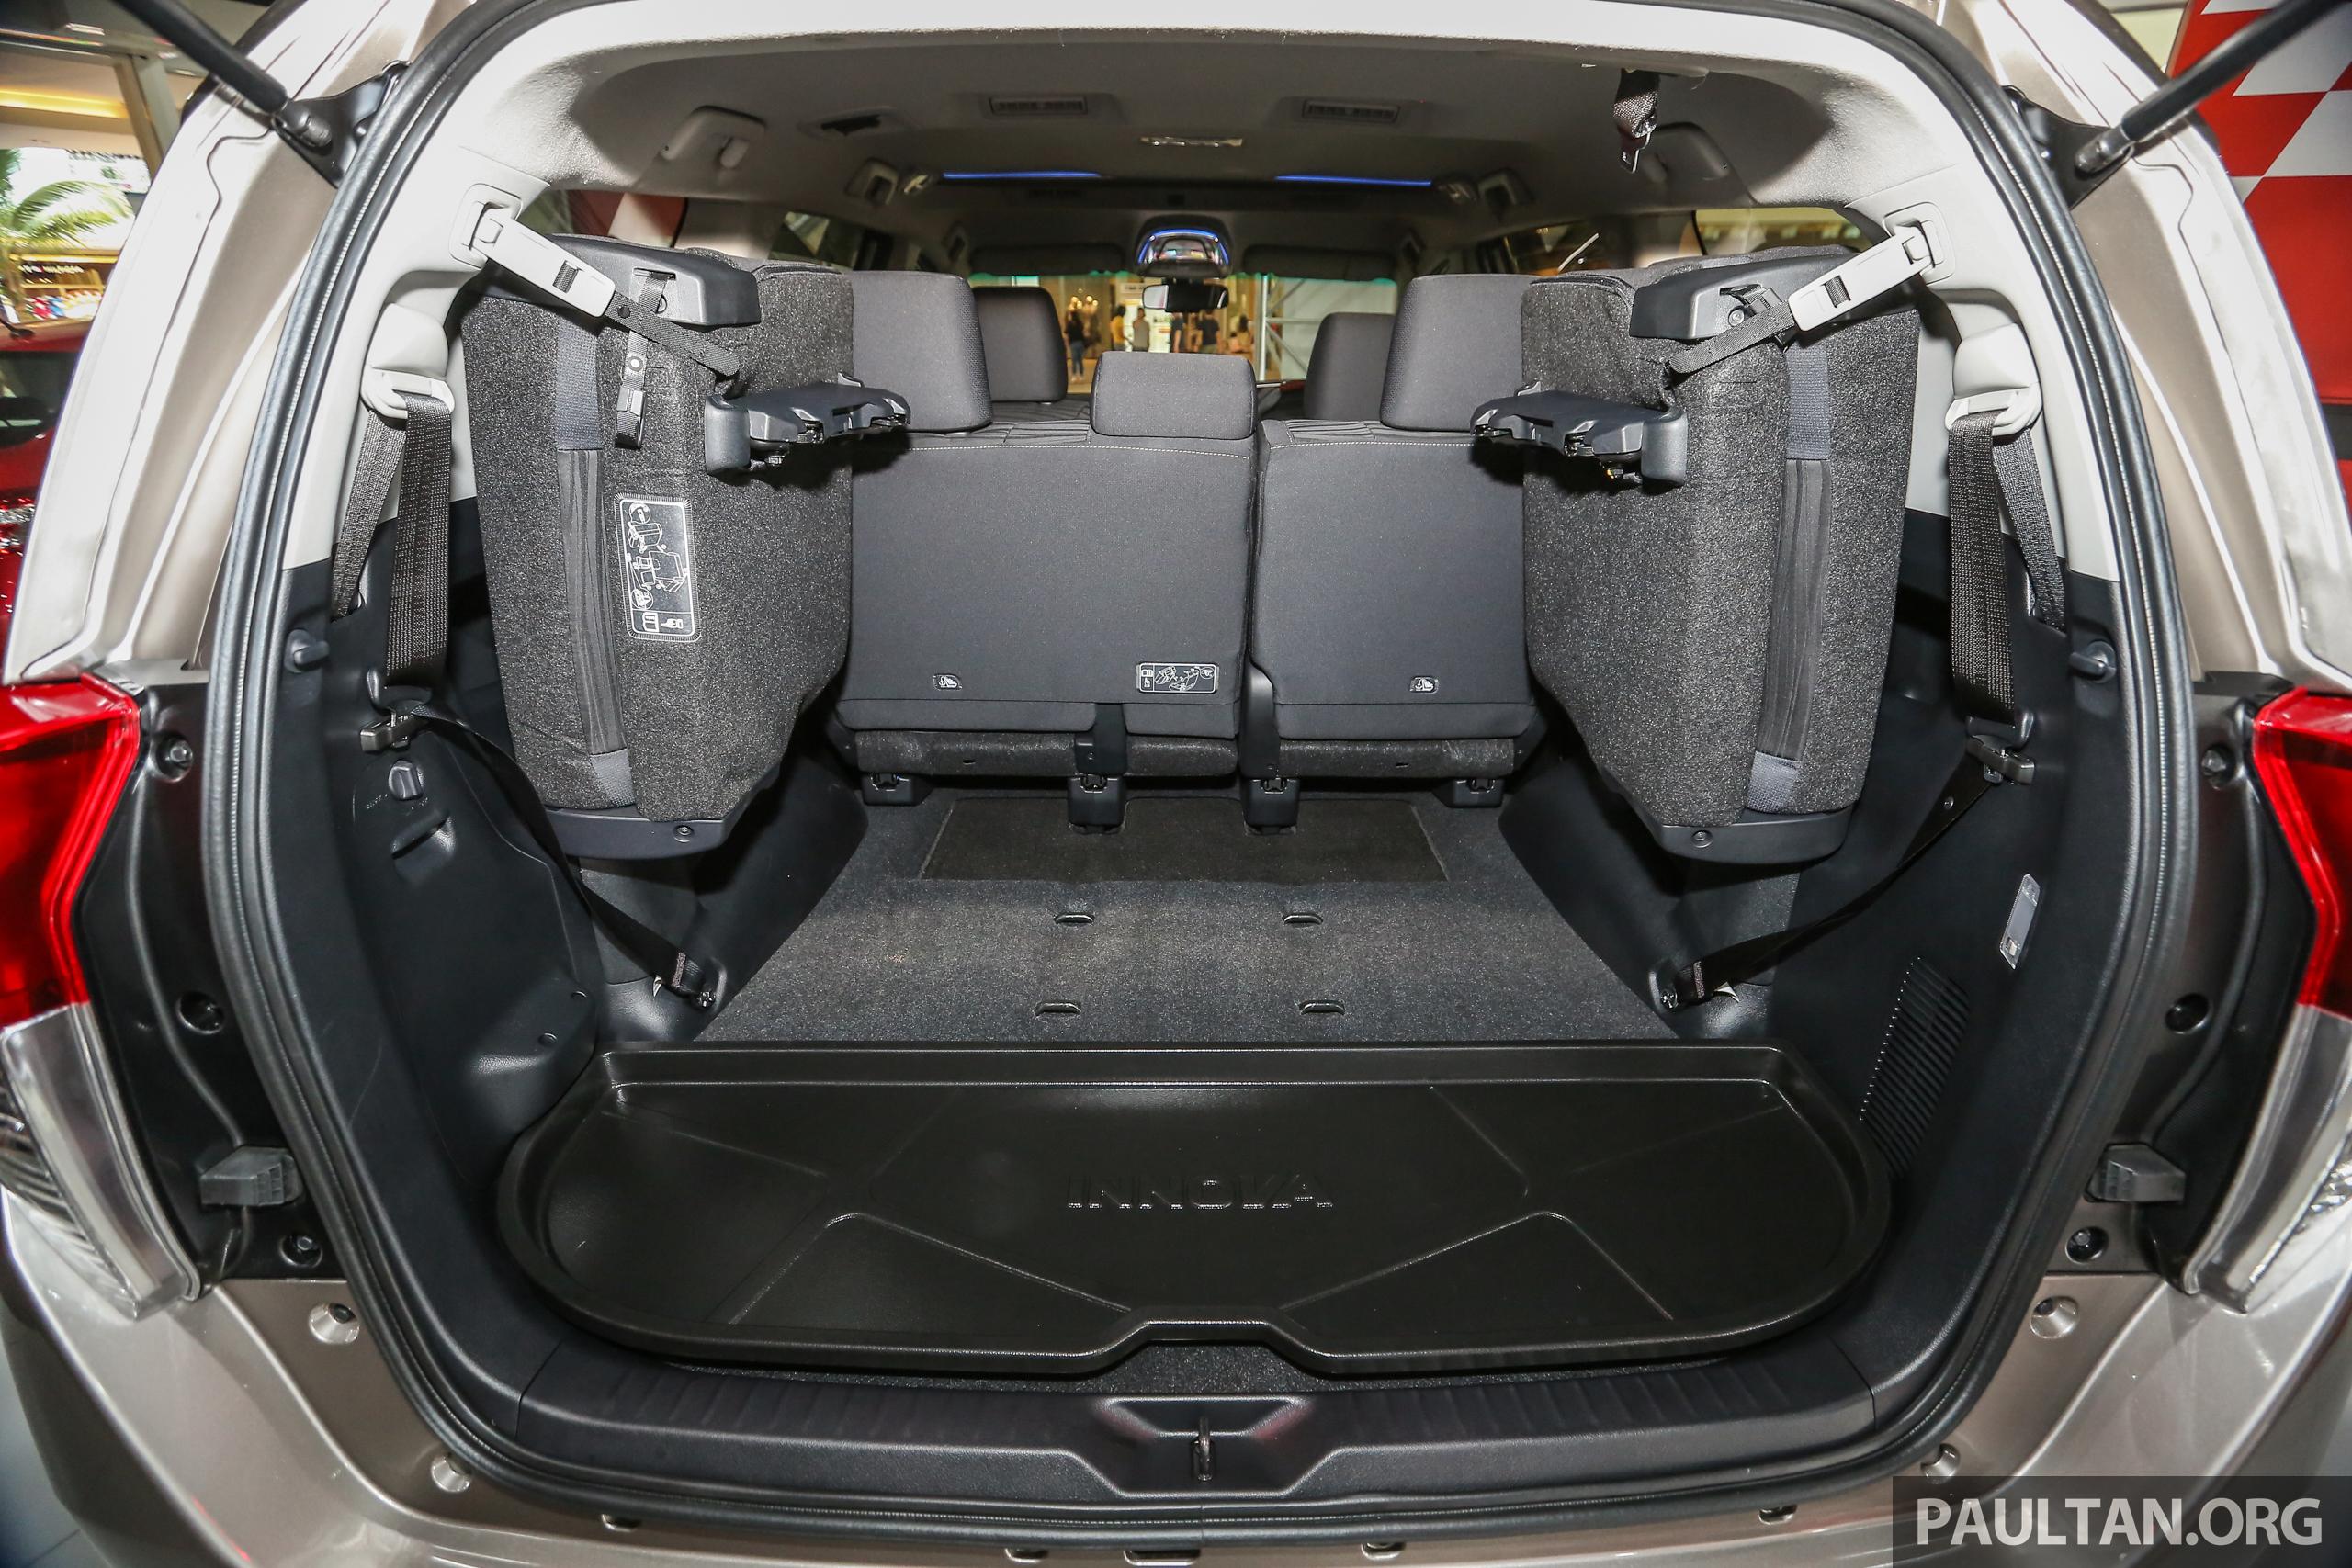 Gallery New Toyota Innova 2 0g On Display 8 Seat Mpv